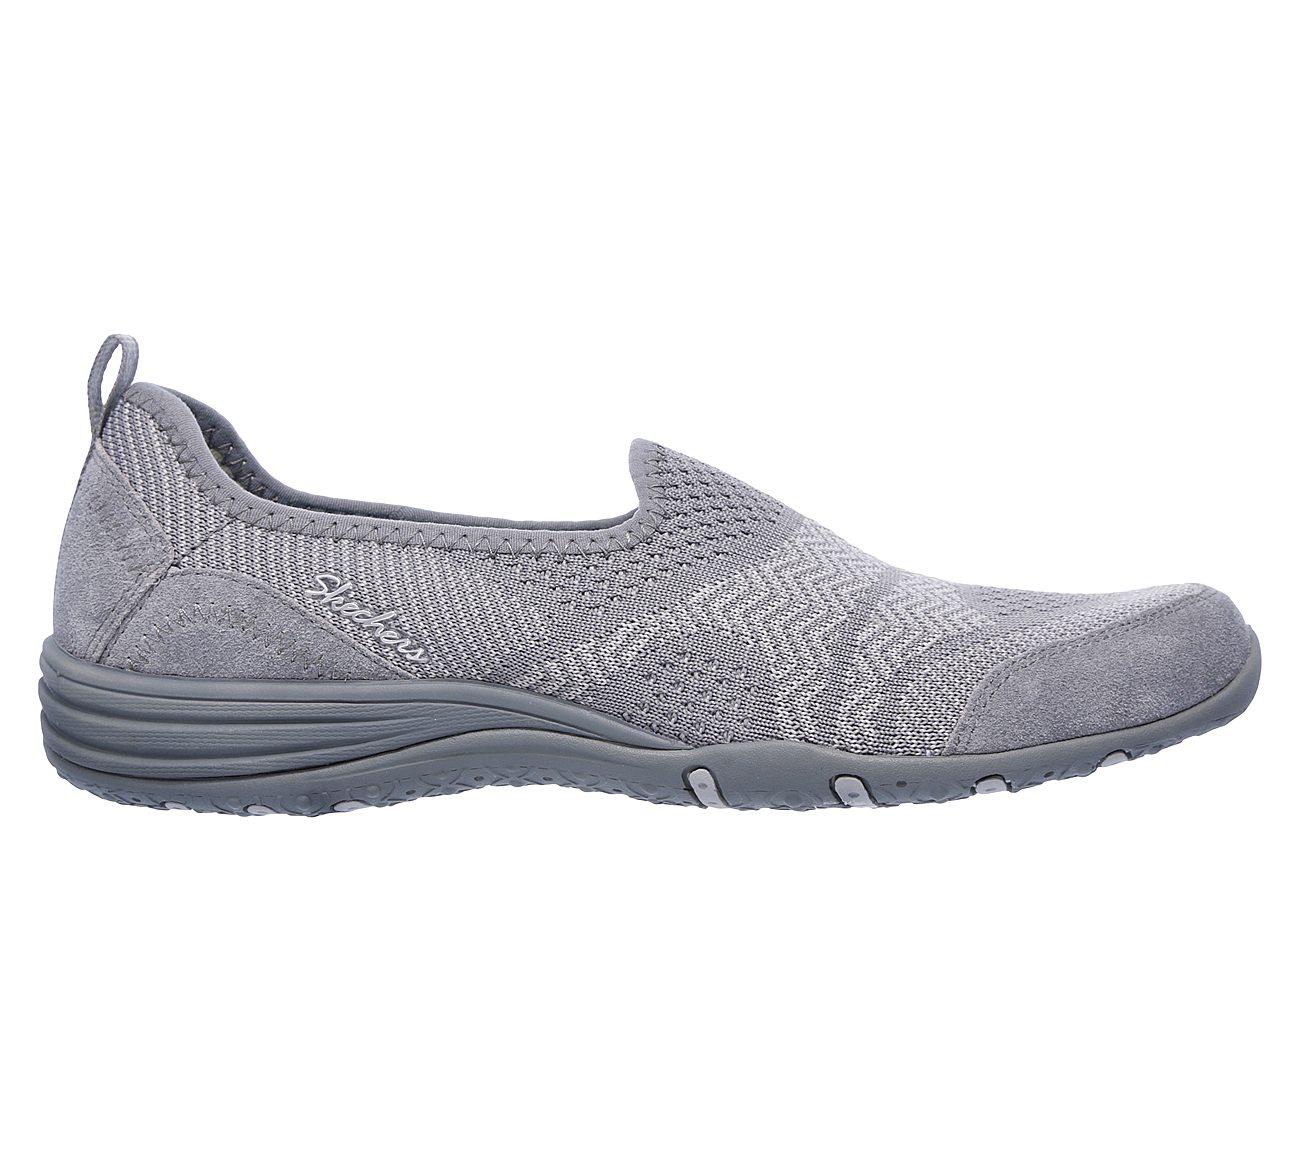 SKECHERS Unity - Moonshadow Active Shoes